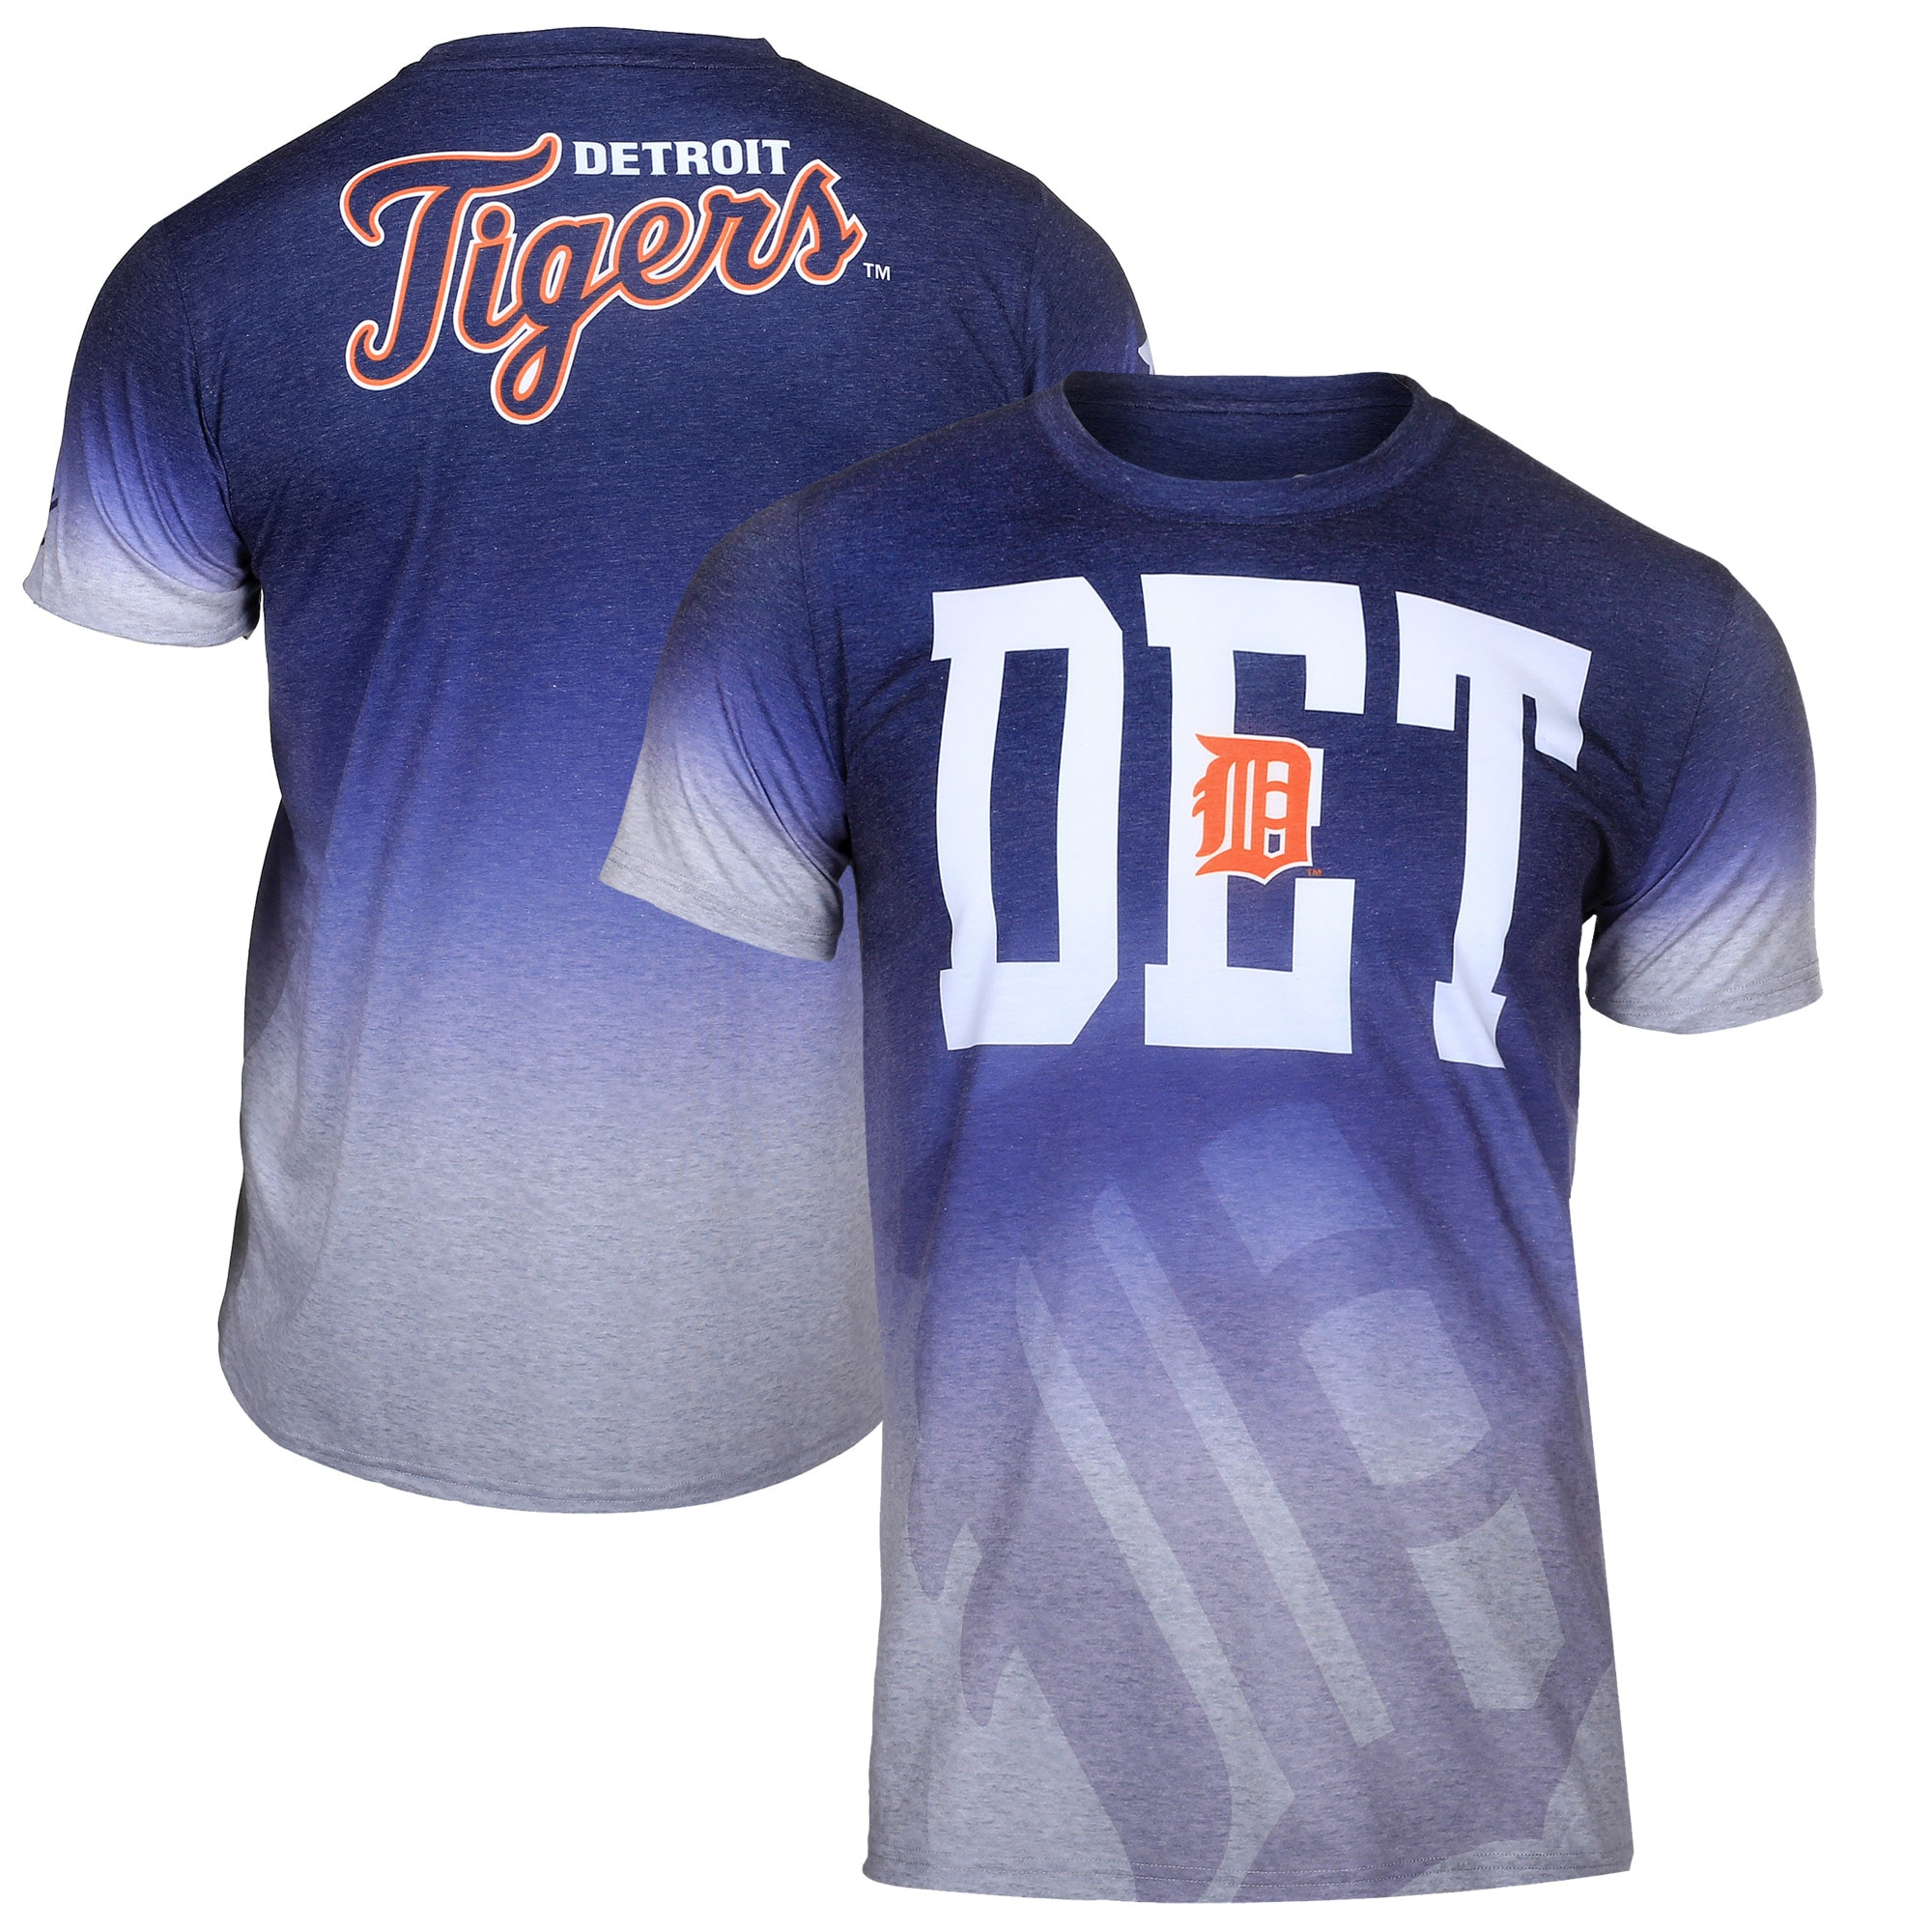 Detroit Tigers Klew Gradient Sublimated T-Shirt - Gray